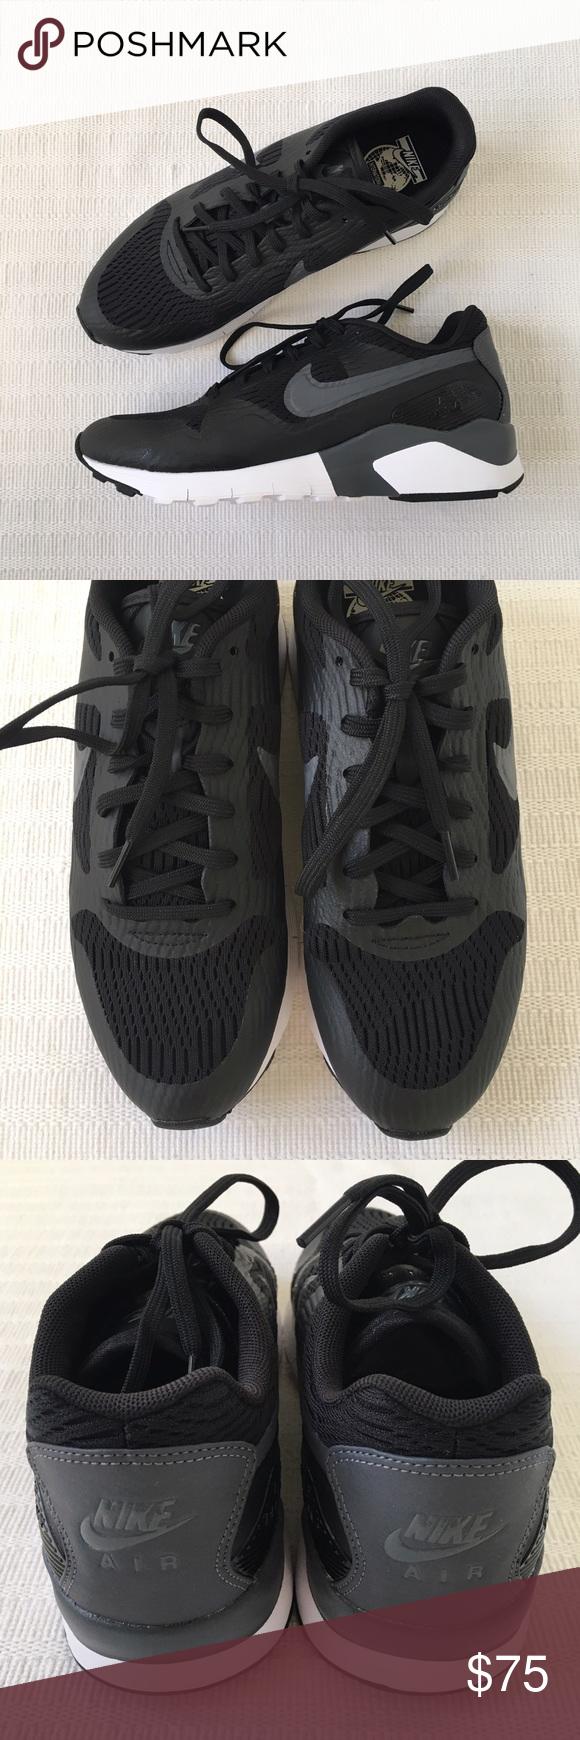 257d5c1d2e Women's Nike Air Pegasus 96/12 Running Shoes Women's Nike Air Pegasus 96/12  Running Shoes Style/Color: 845012-001 * Women's size 8.5 * NEW in box (no  lid) ...